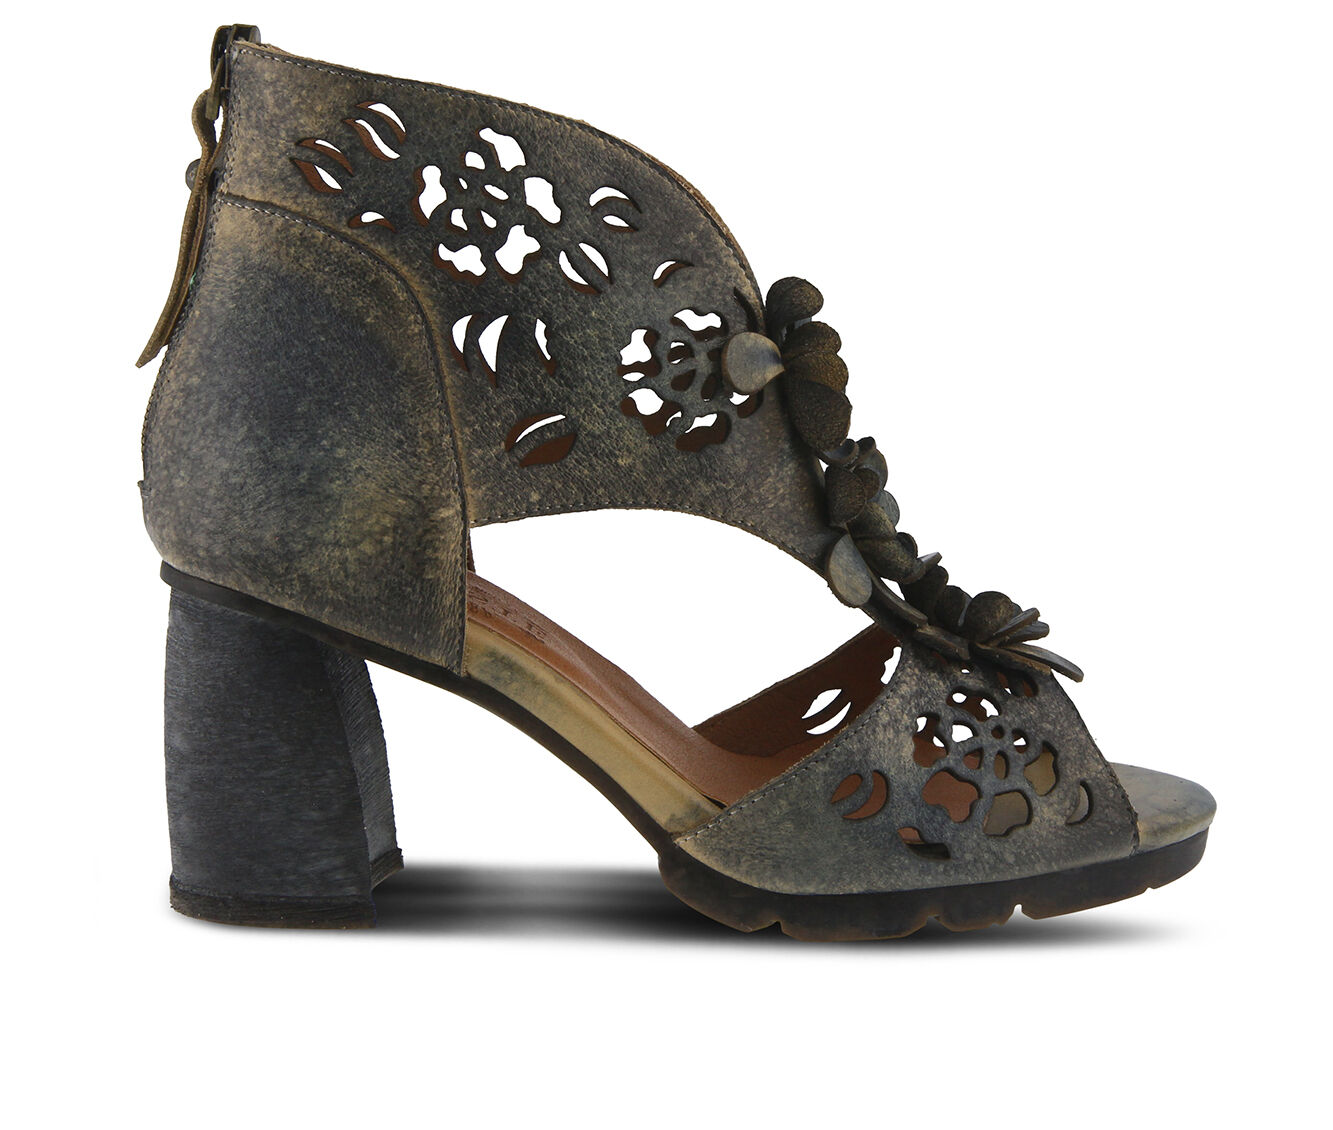 uk shoes_kd6245